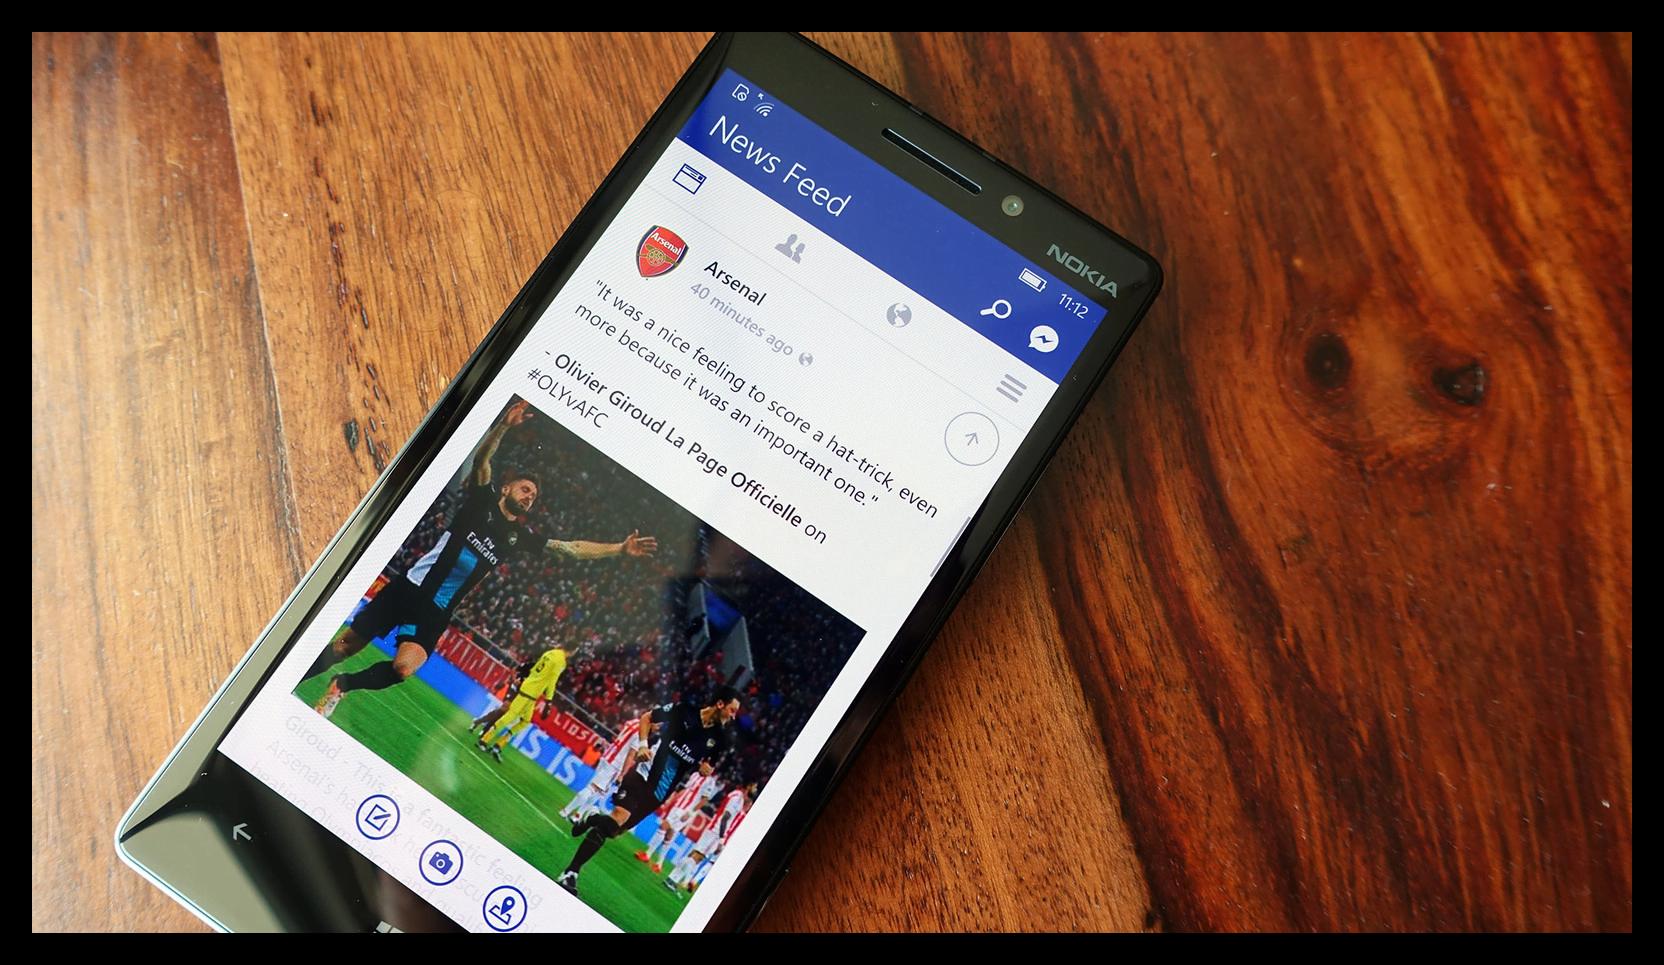 Kartinka-Facebook-na-Windows-Phone.png